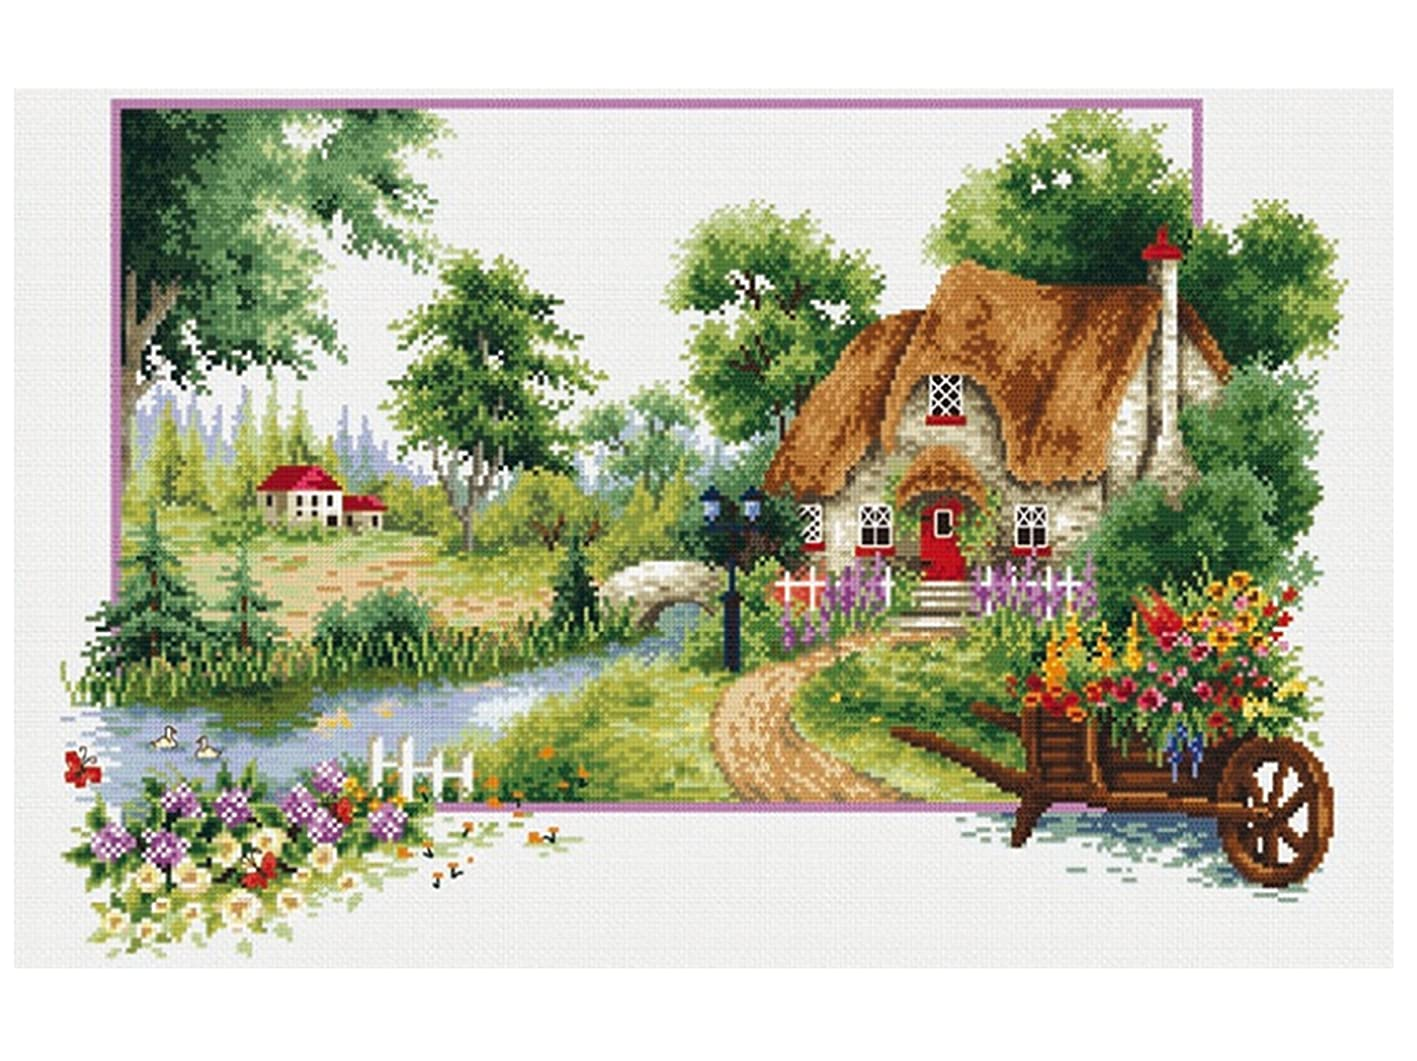 TINMI ATRS DIY Stamped Cross Stitch Landscape Kits Thread Needlework Embroidery Printed Pattern 11CT Home Decoration Four Seasons (Summer Perfume, 27x19 inch) gtgbvagnbav701